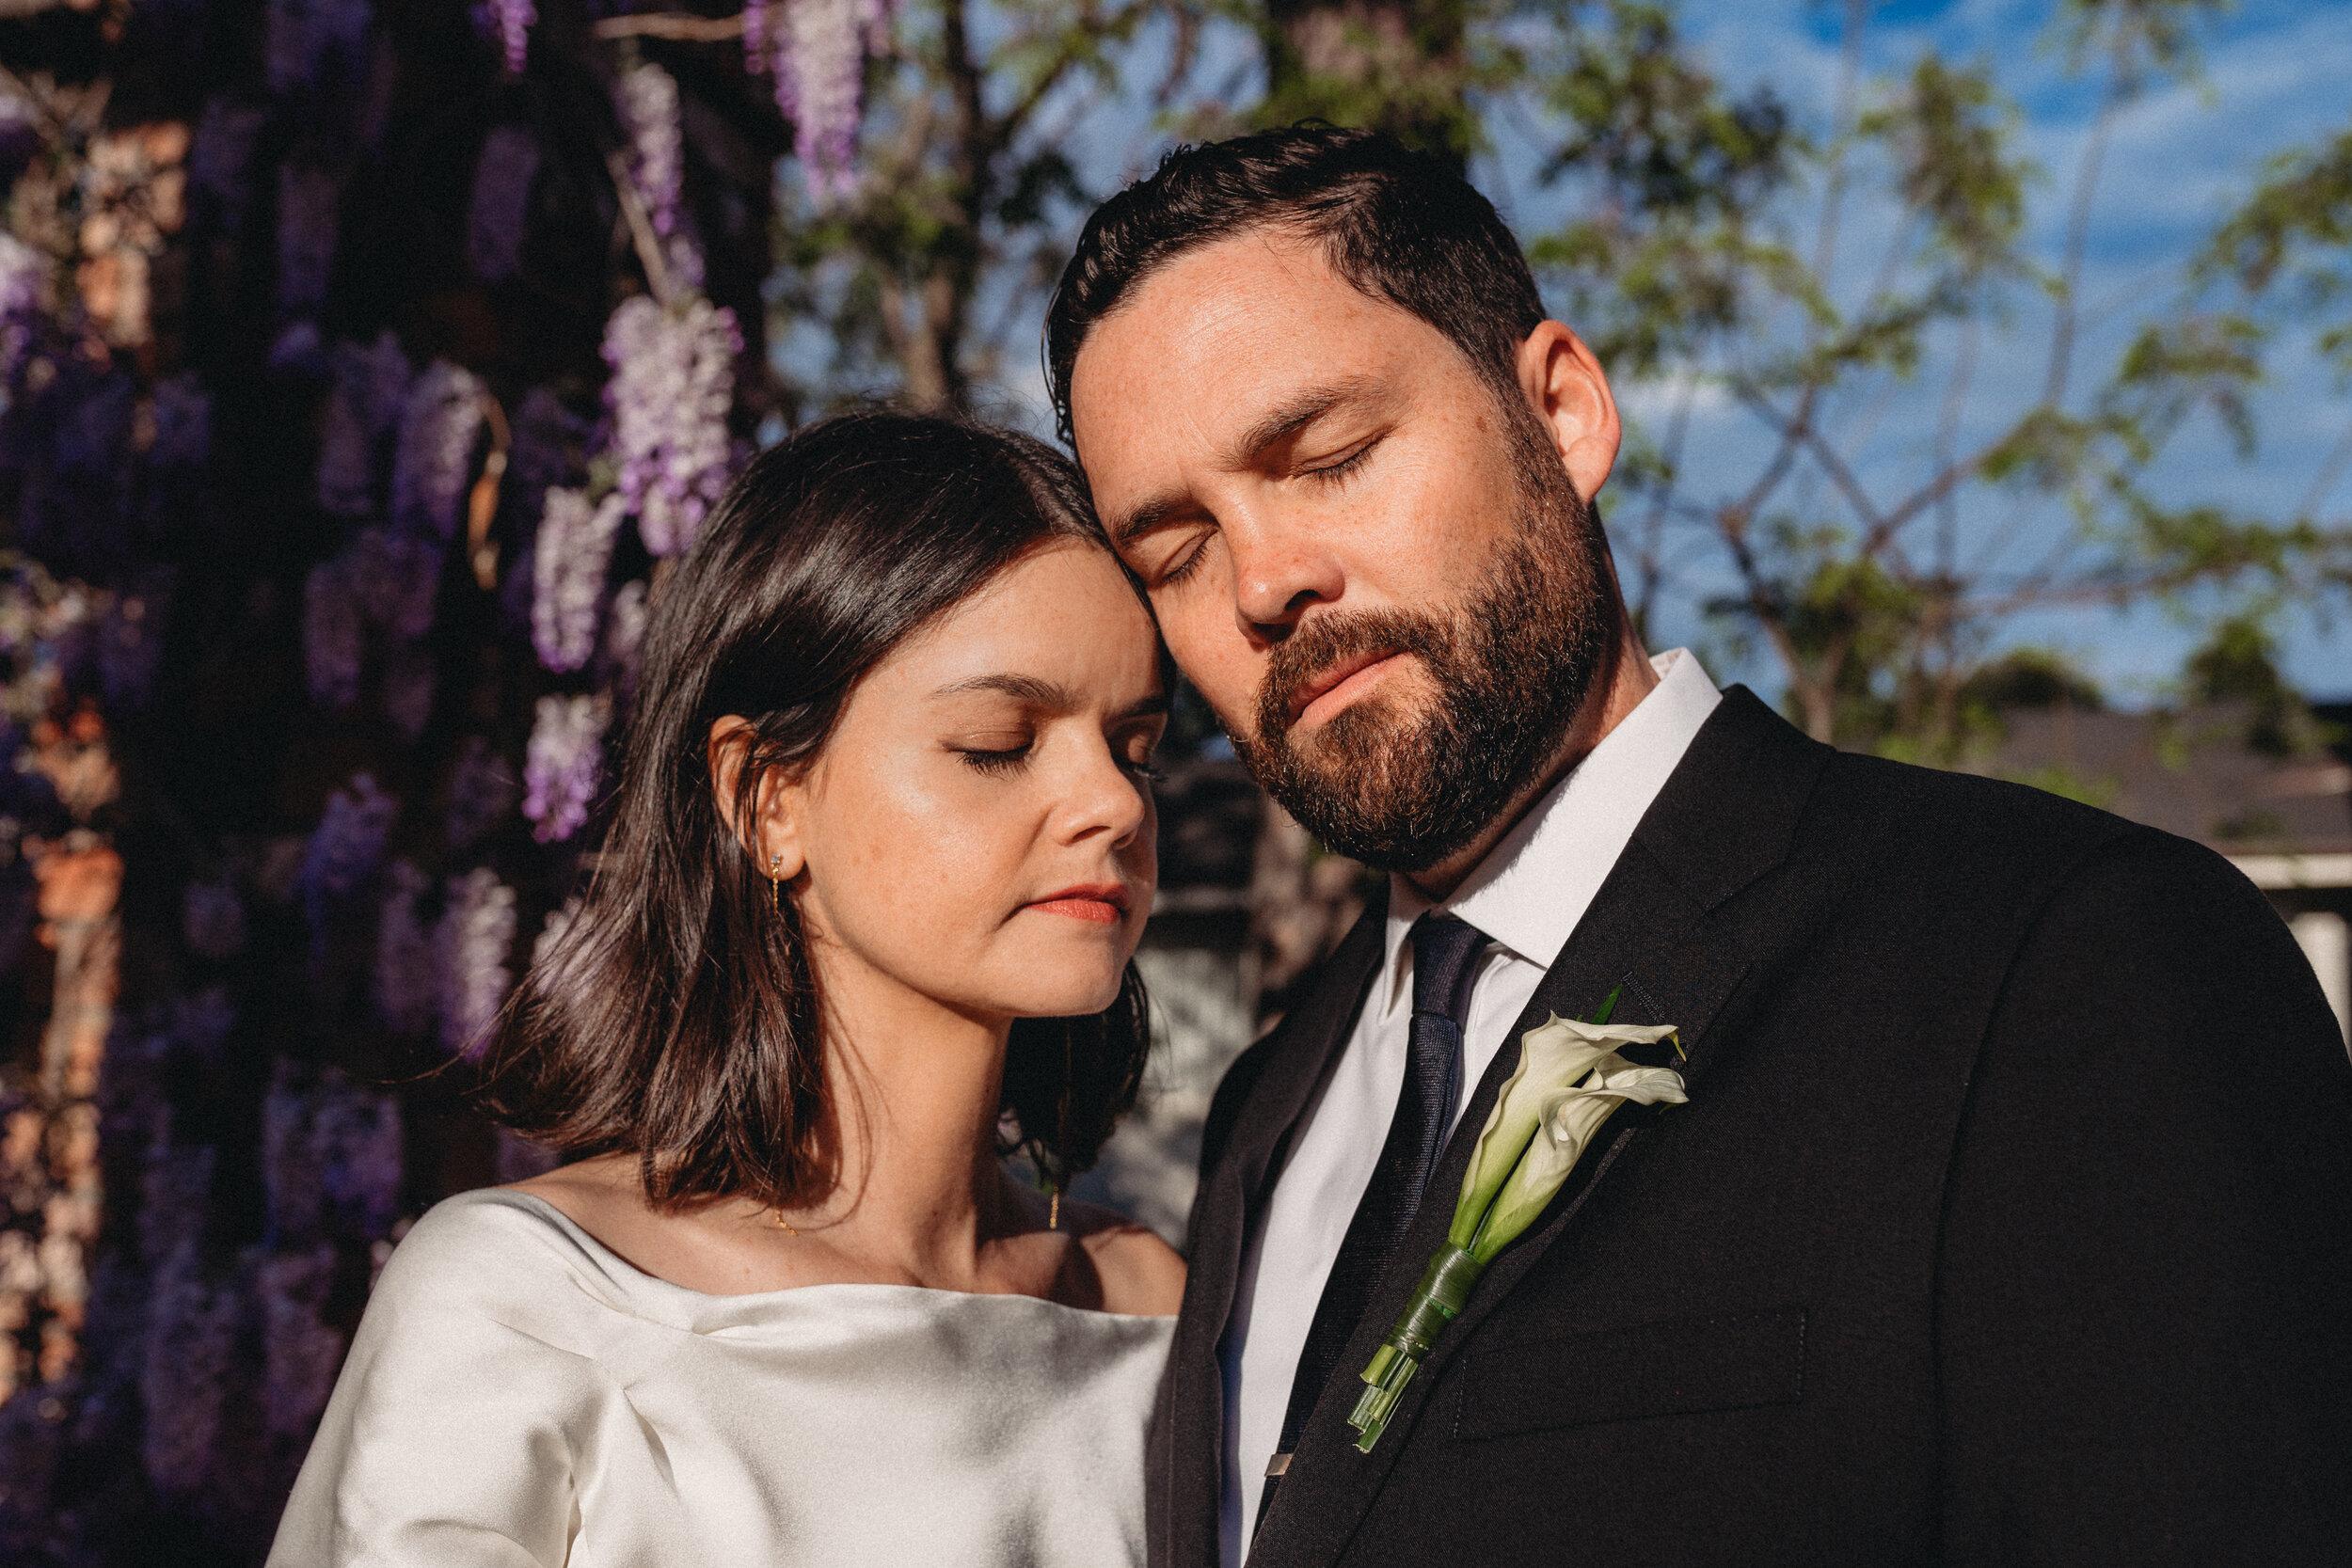 wedding-photography-santa-barbara-courthouse-rebeccaylasotras-158.jpg